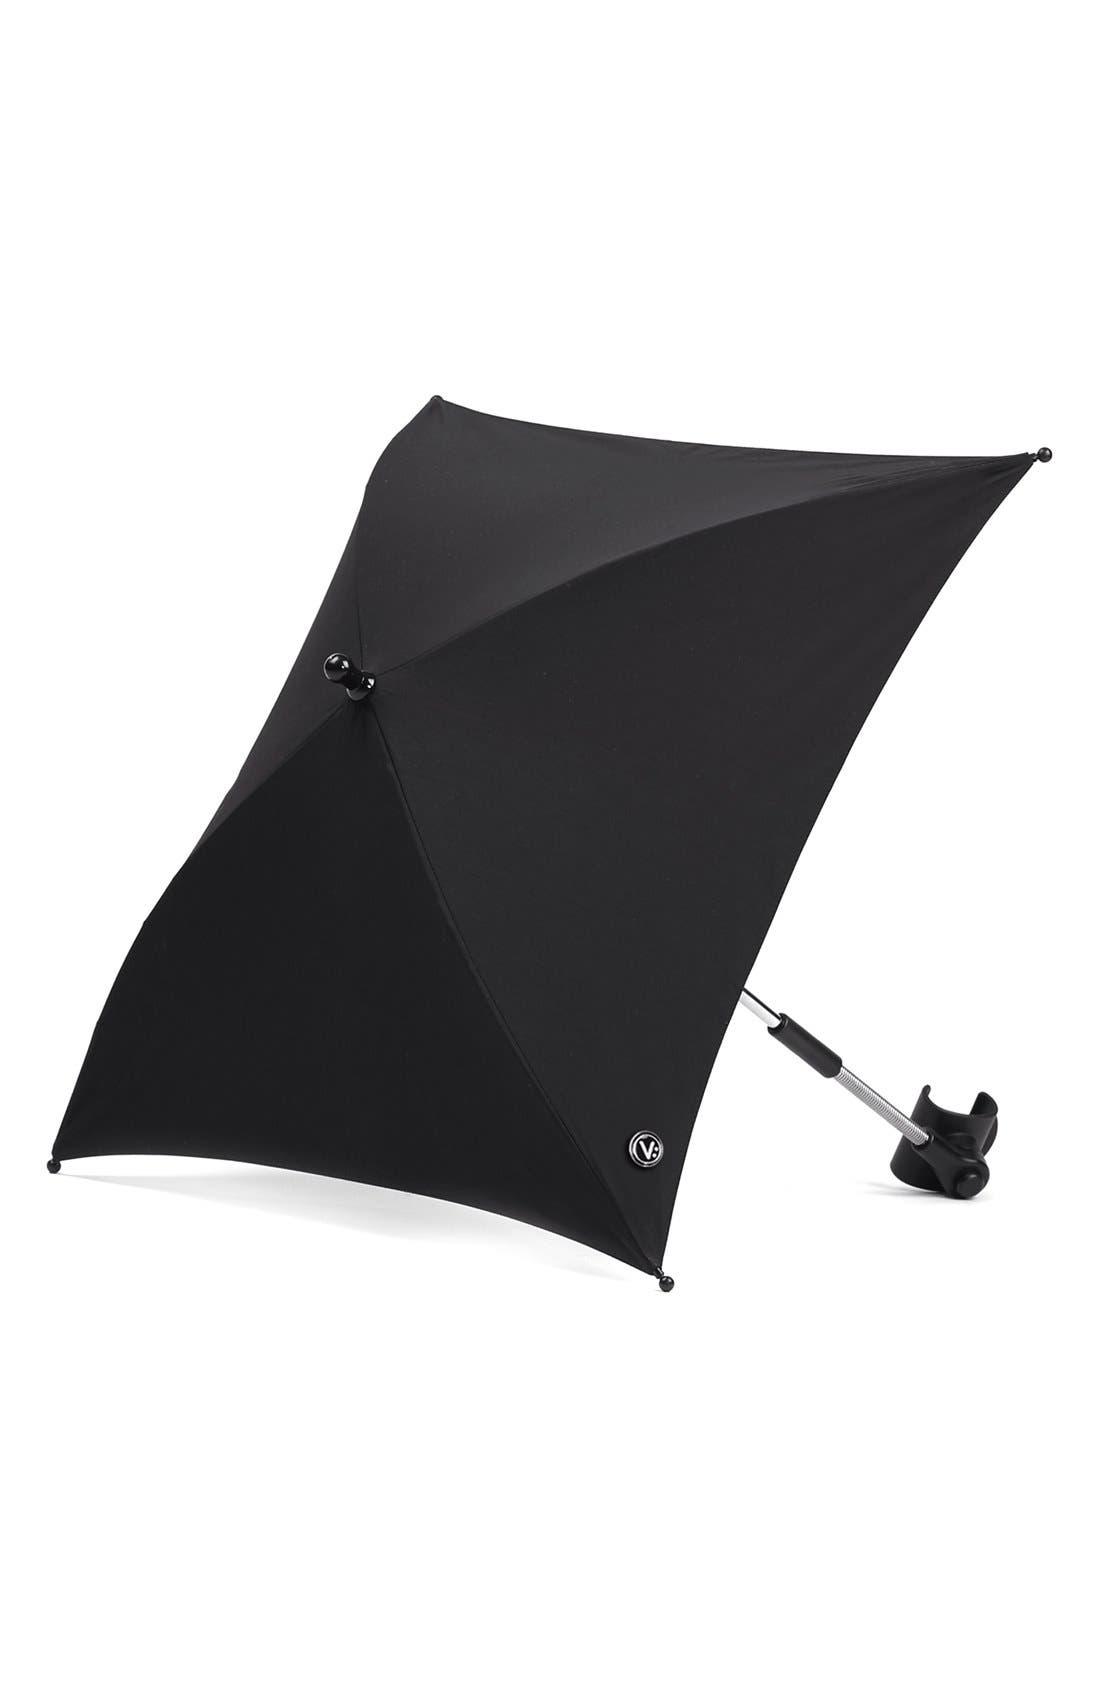 'Igo - Reflect Cosmo Black' Water Resistant Stroller Umbrella,                             Main thumbnail 1, color,                             Black